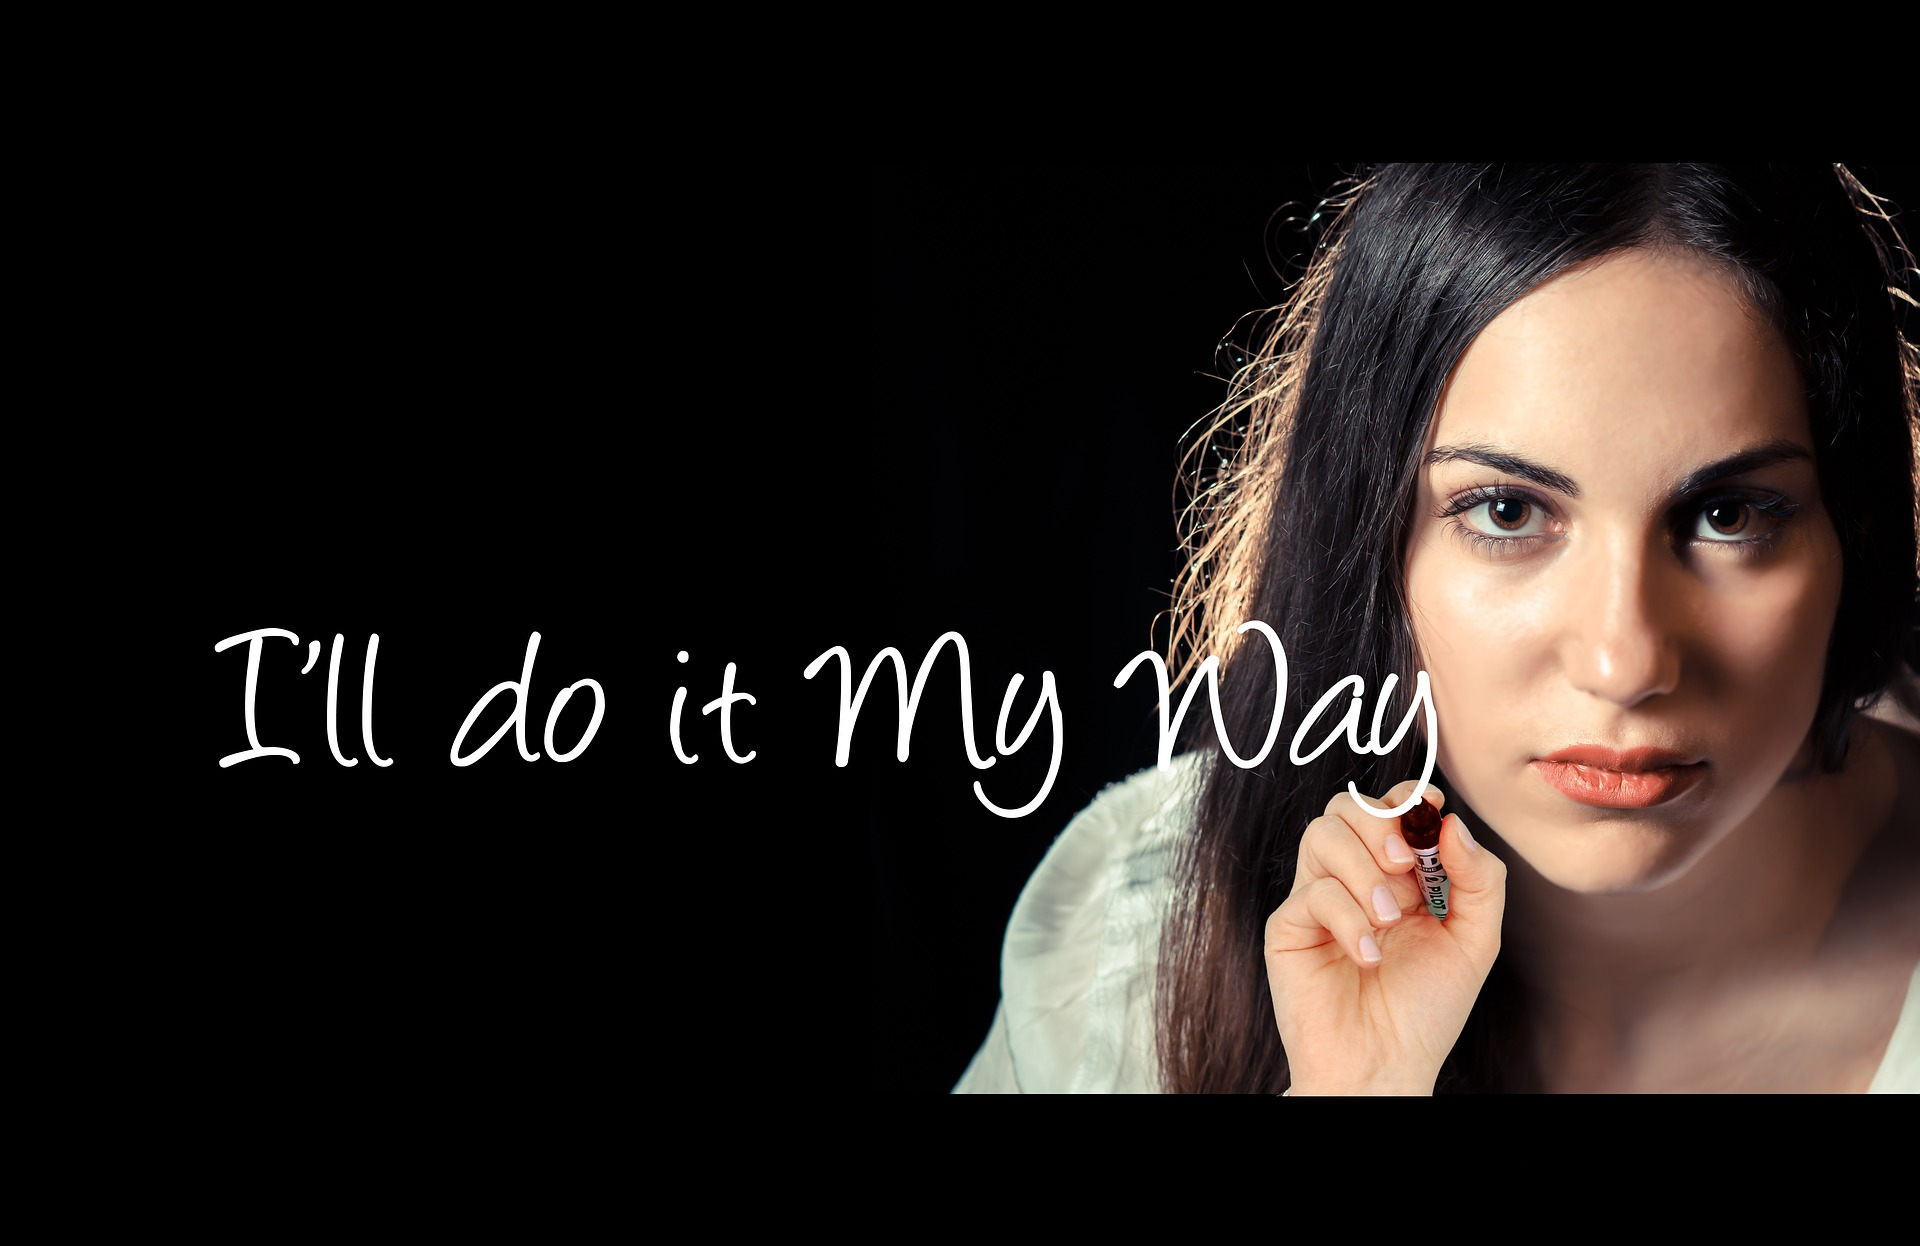 femme sur fond noir ecriture i'll do it my way